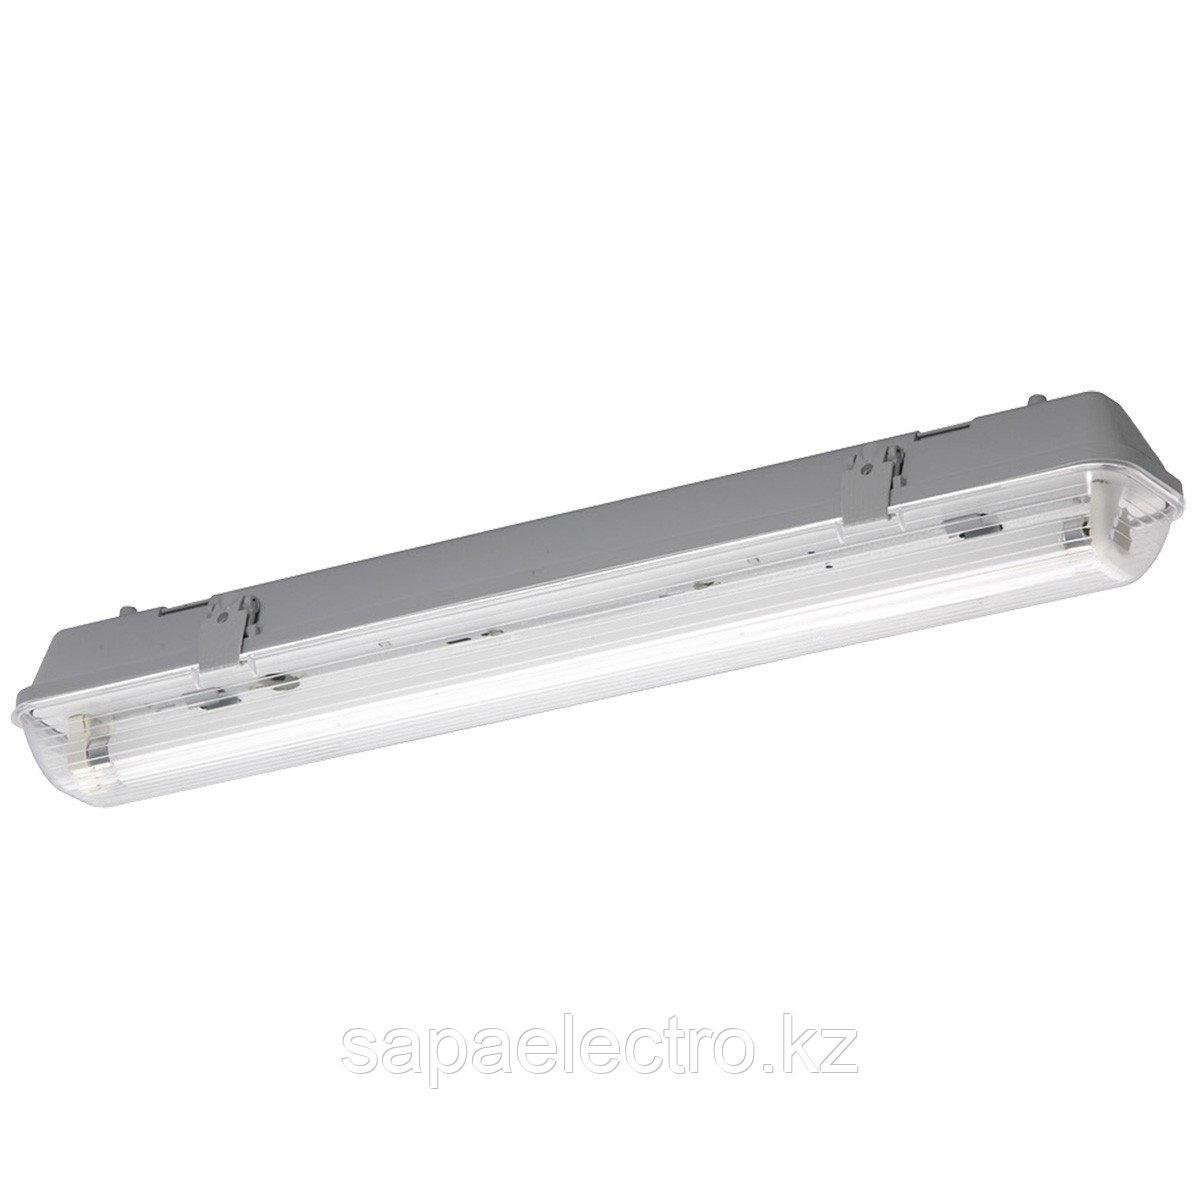 Св-к LEDTUBE LZG 1x9W +лампа (60см) MEGALUX